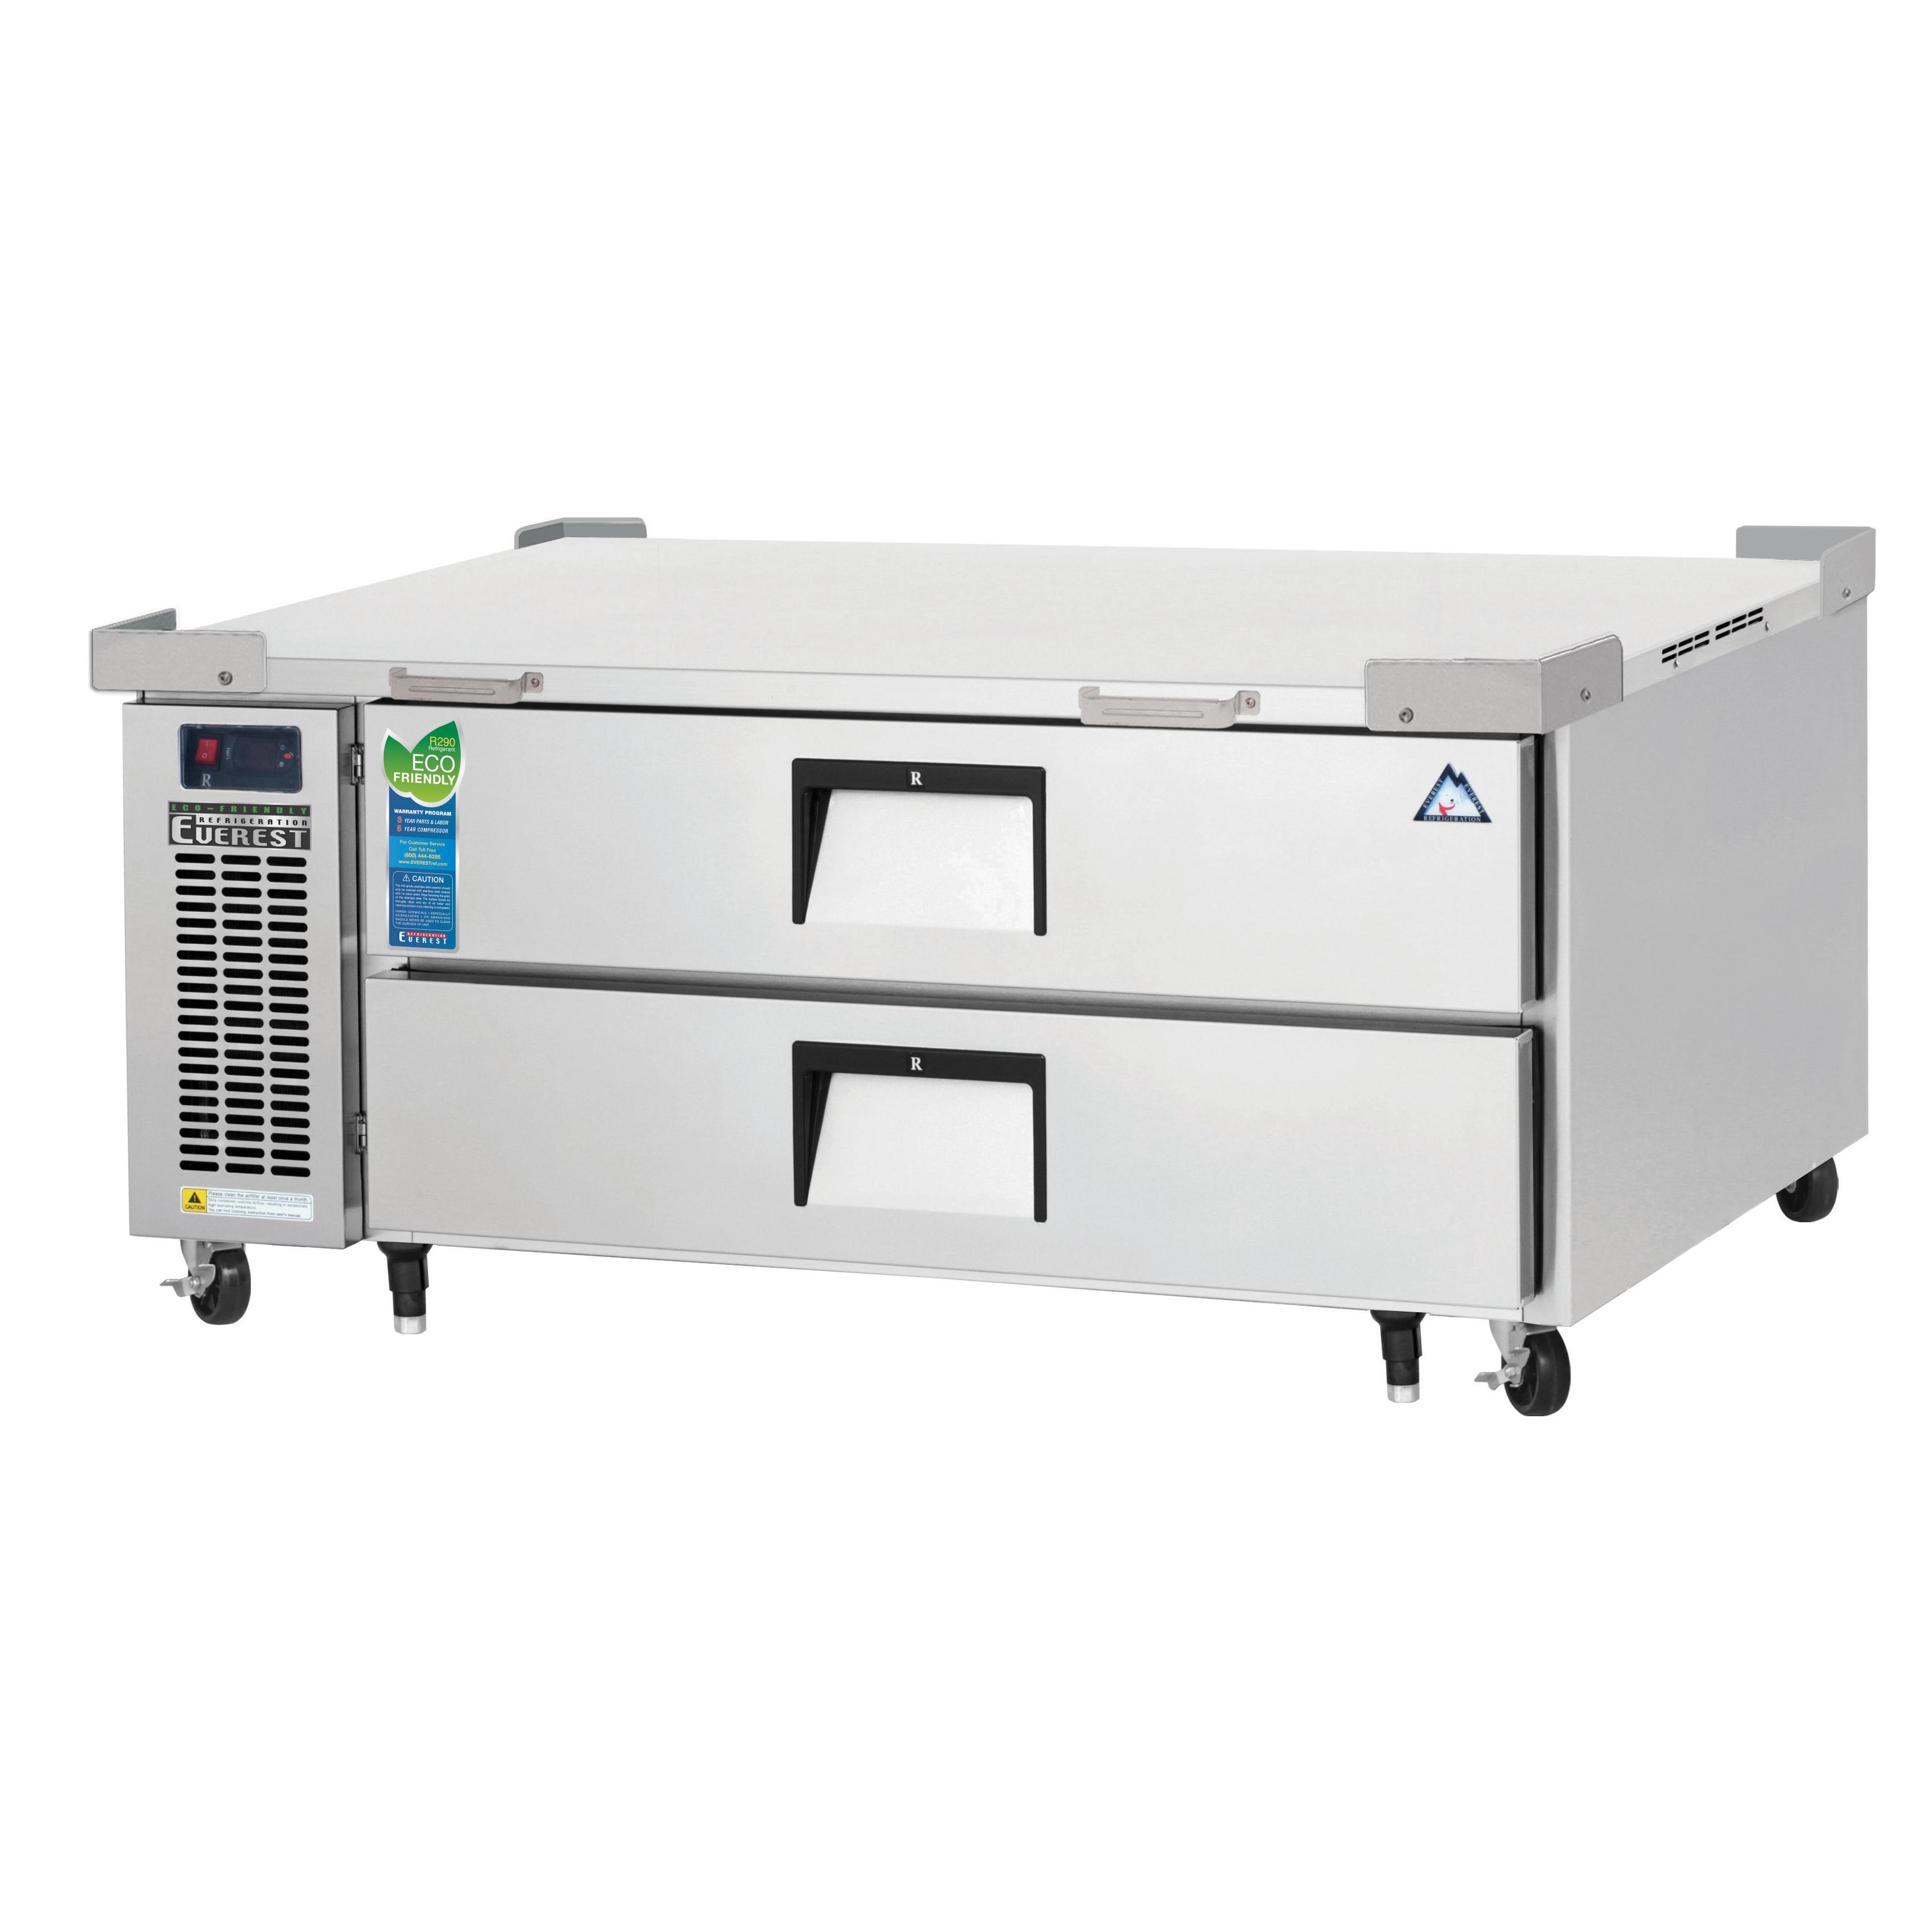 Everest Refrigeration ECB52D2 equipment stand, refrigerated base